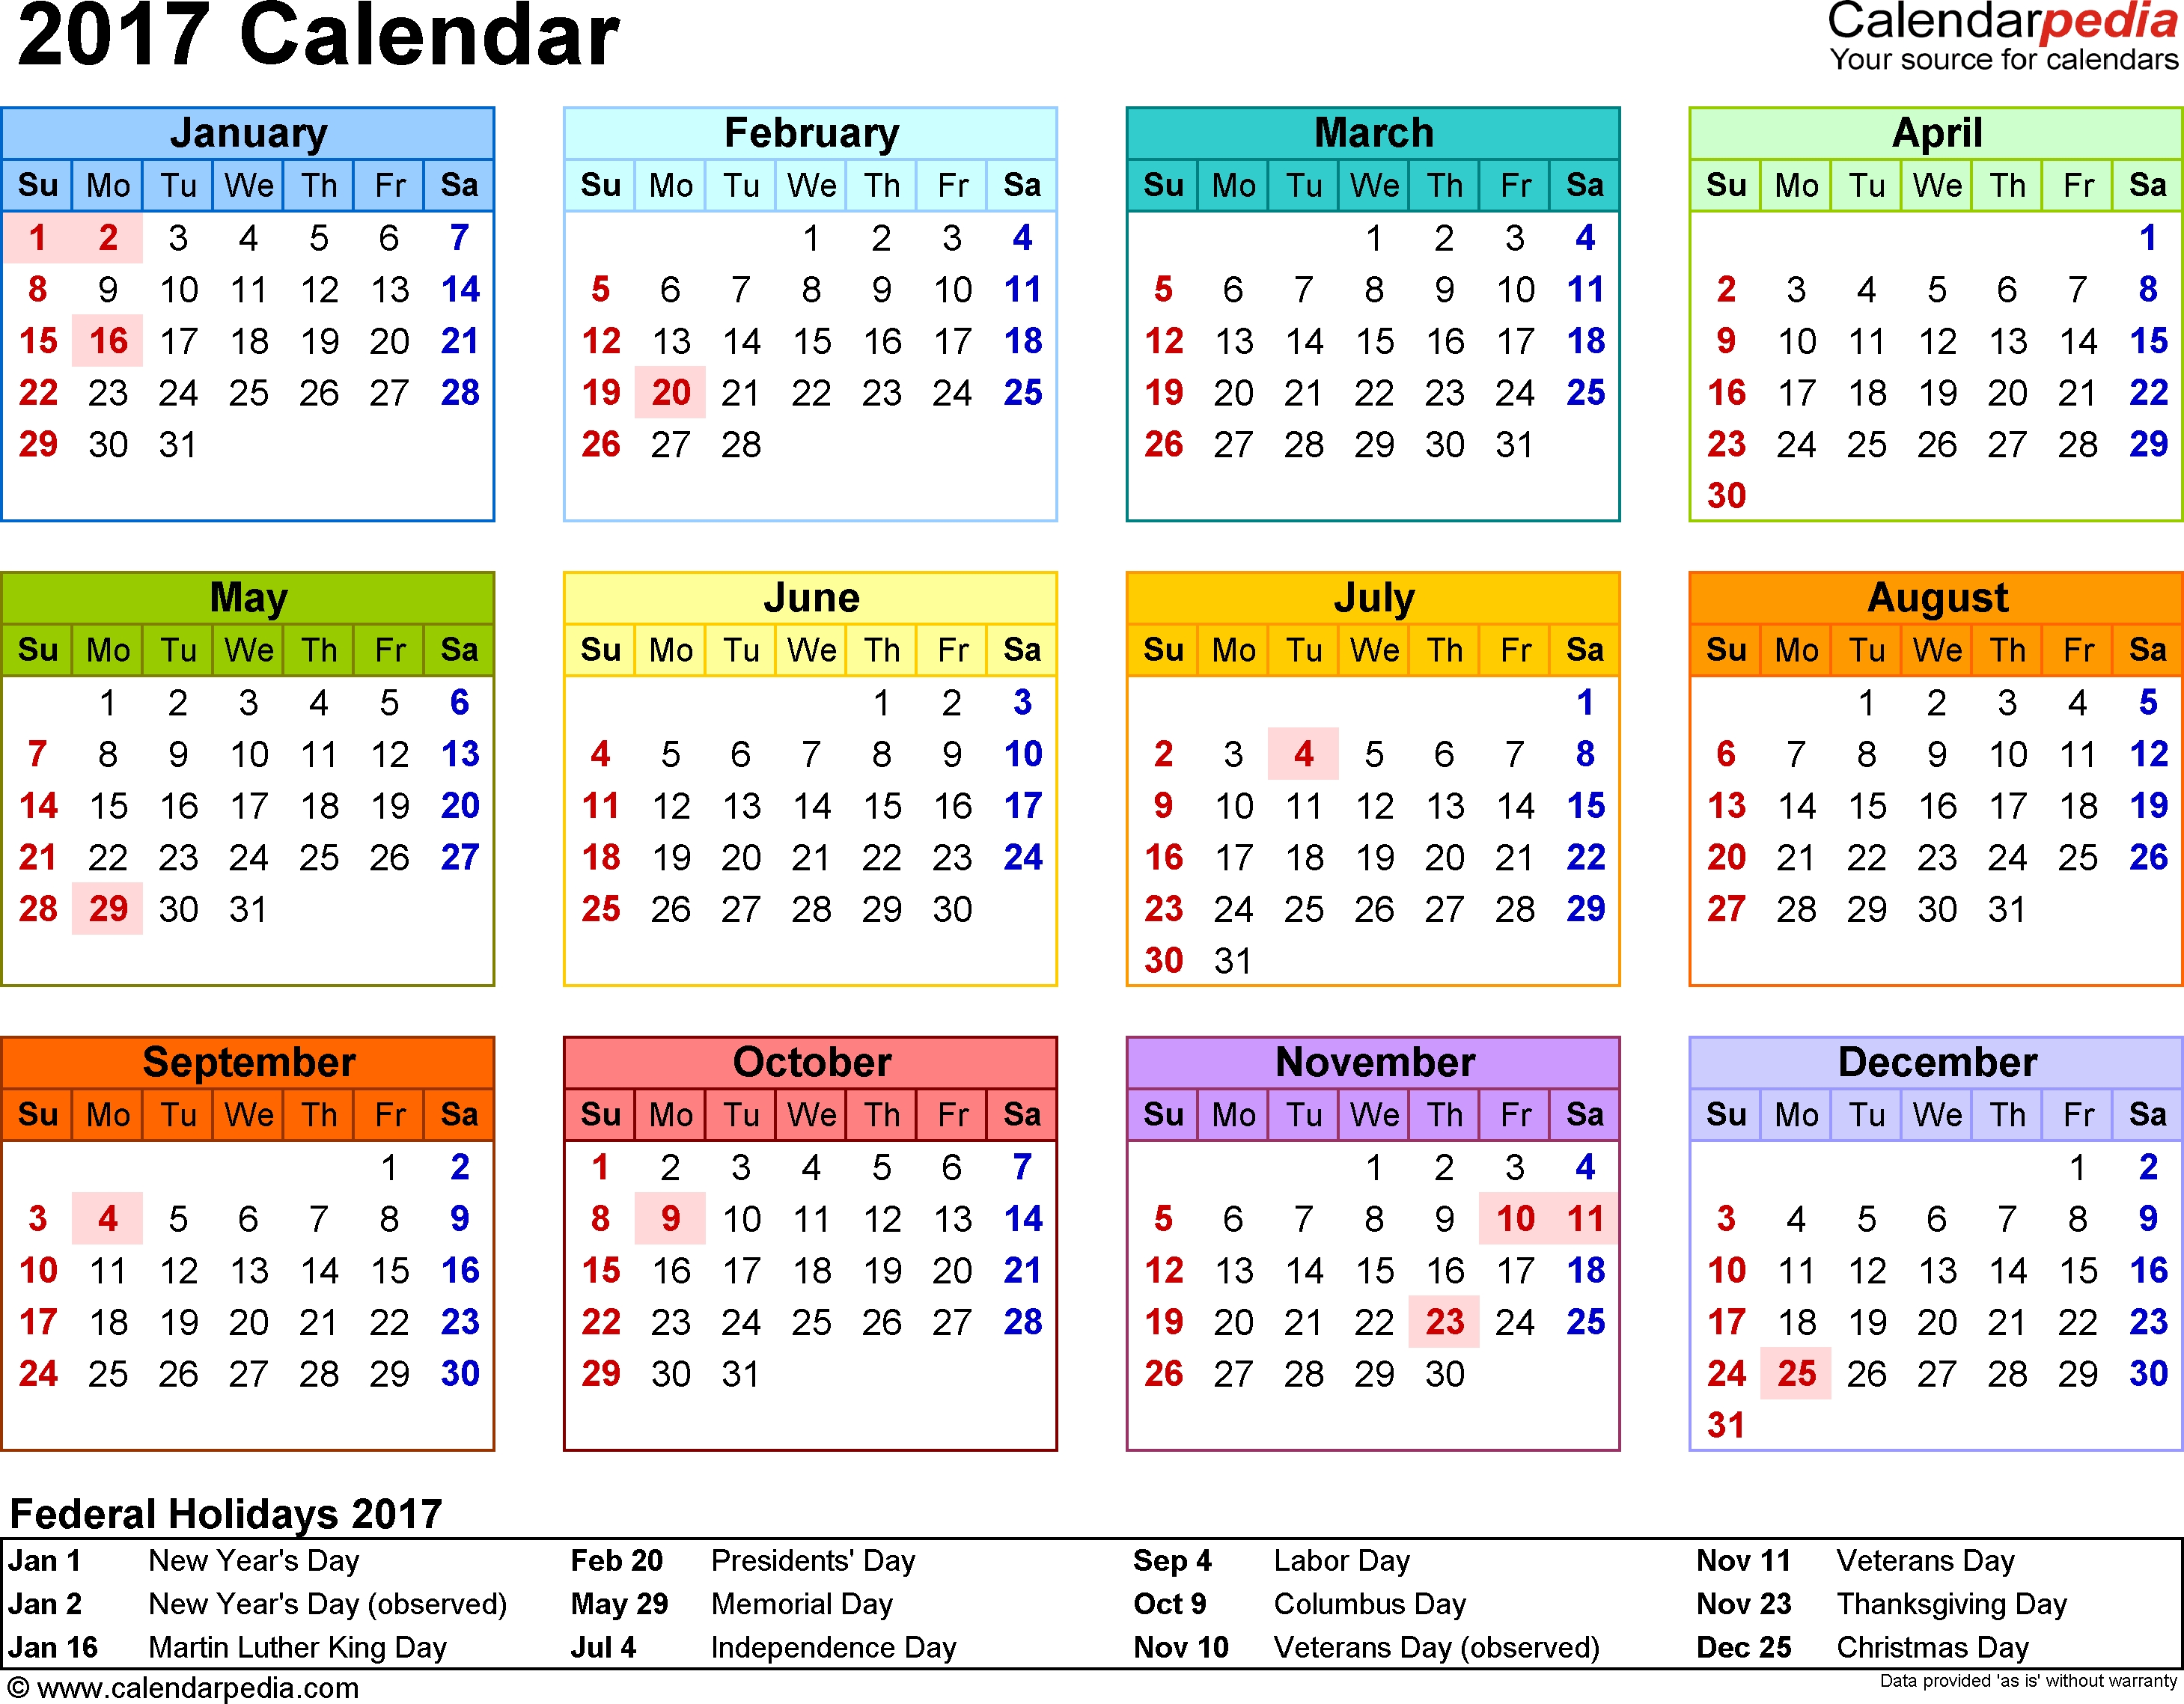 2017 Calendar Pdf 17 Free Printable Calendar Templates 89uj